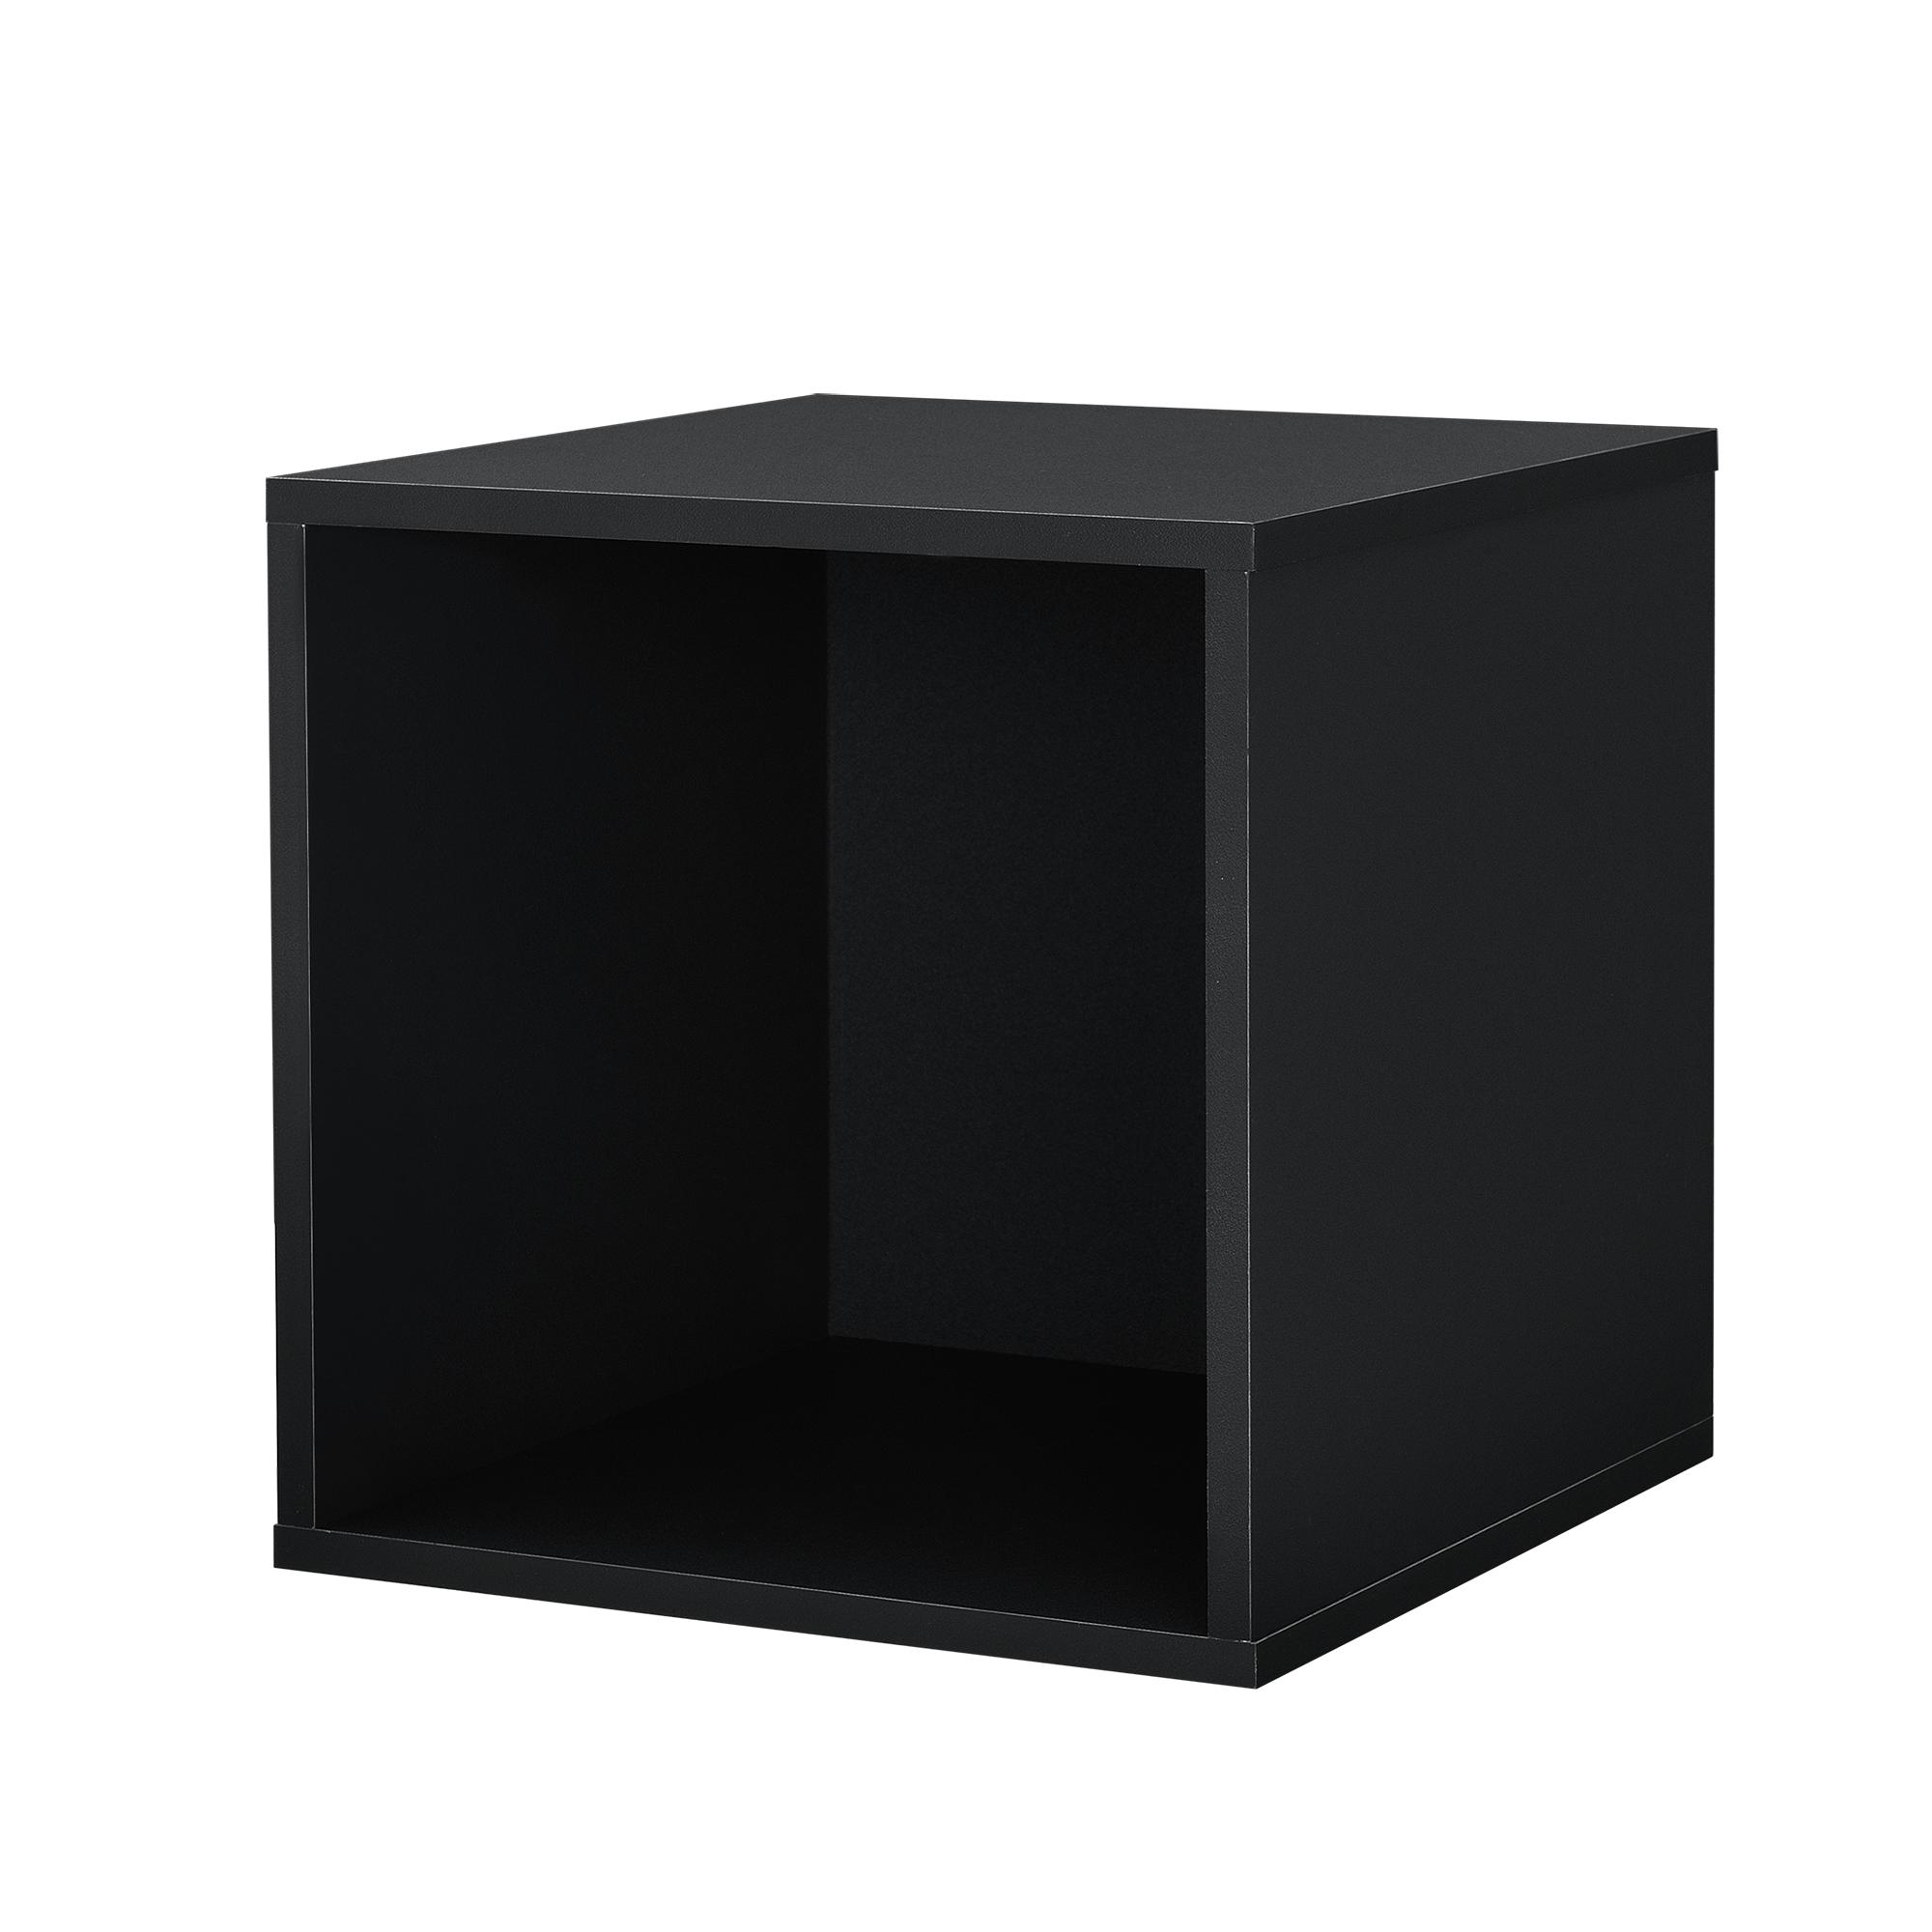 regal 30x30x30cm schwarz wandregal h ngeregal b cherregal kombinierbar ebay. Black Bedroom Furniture Sets. Home Design Ideas